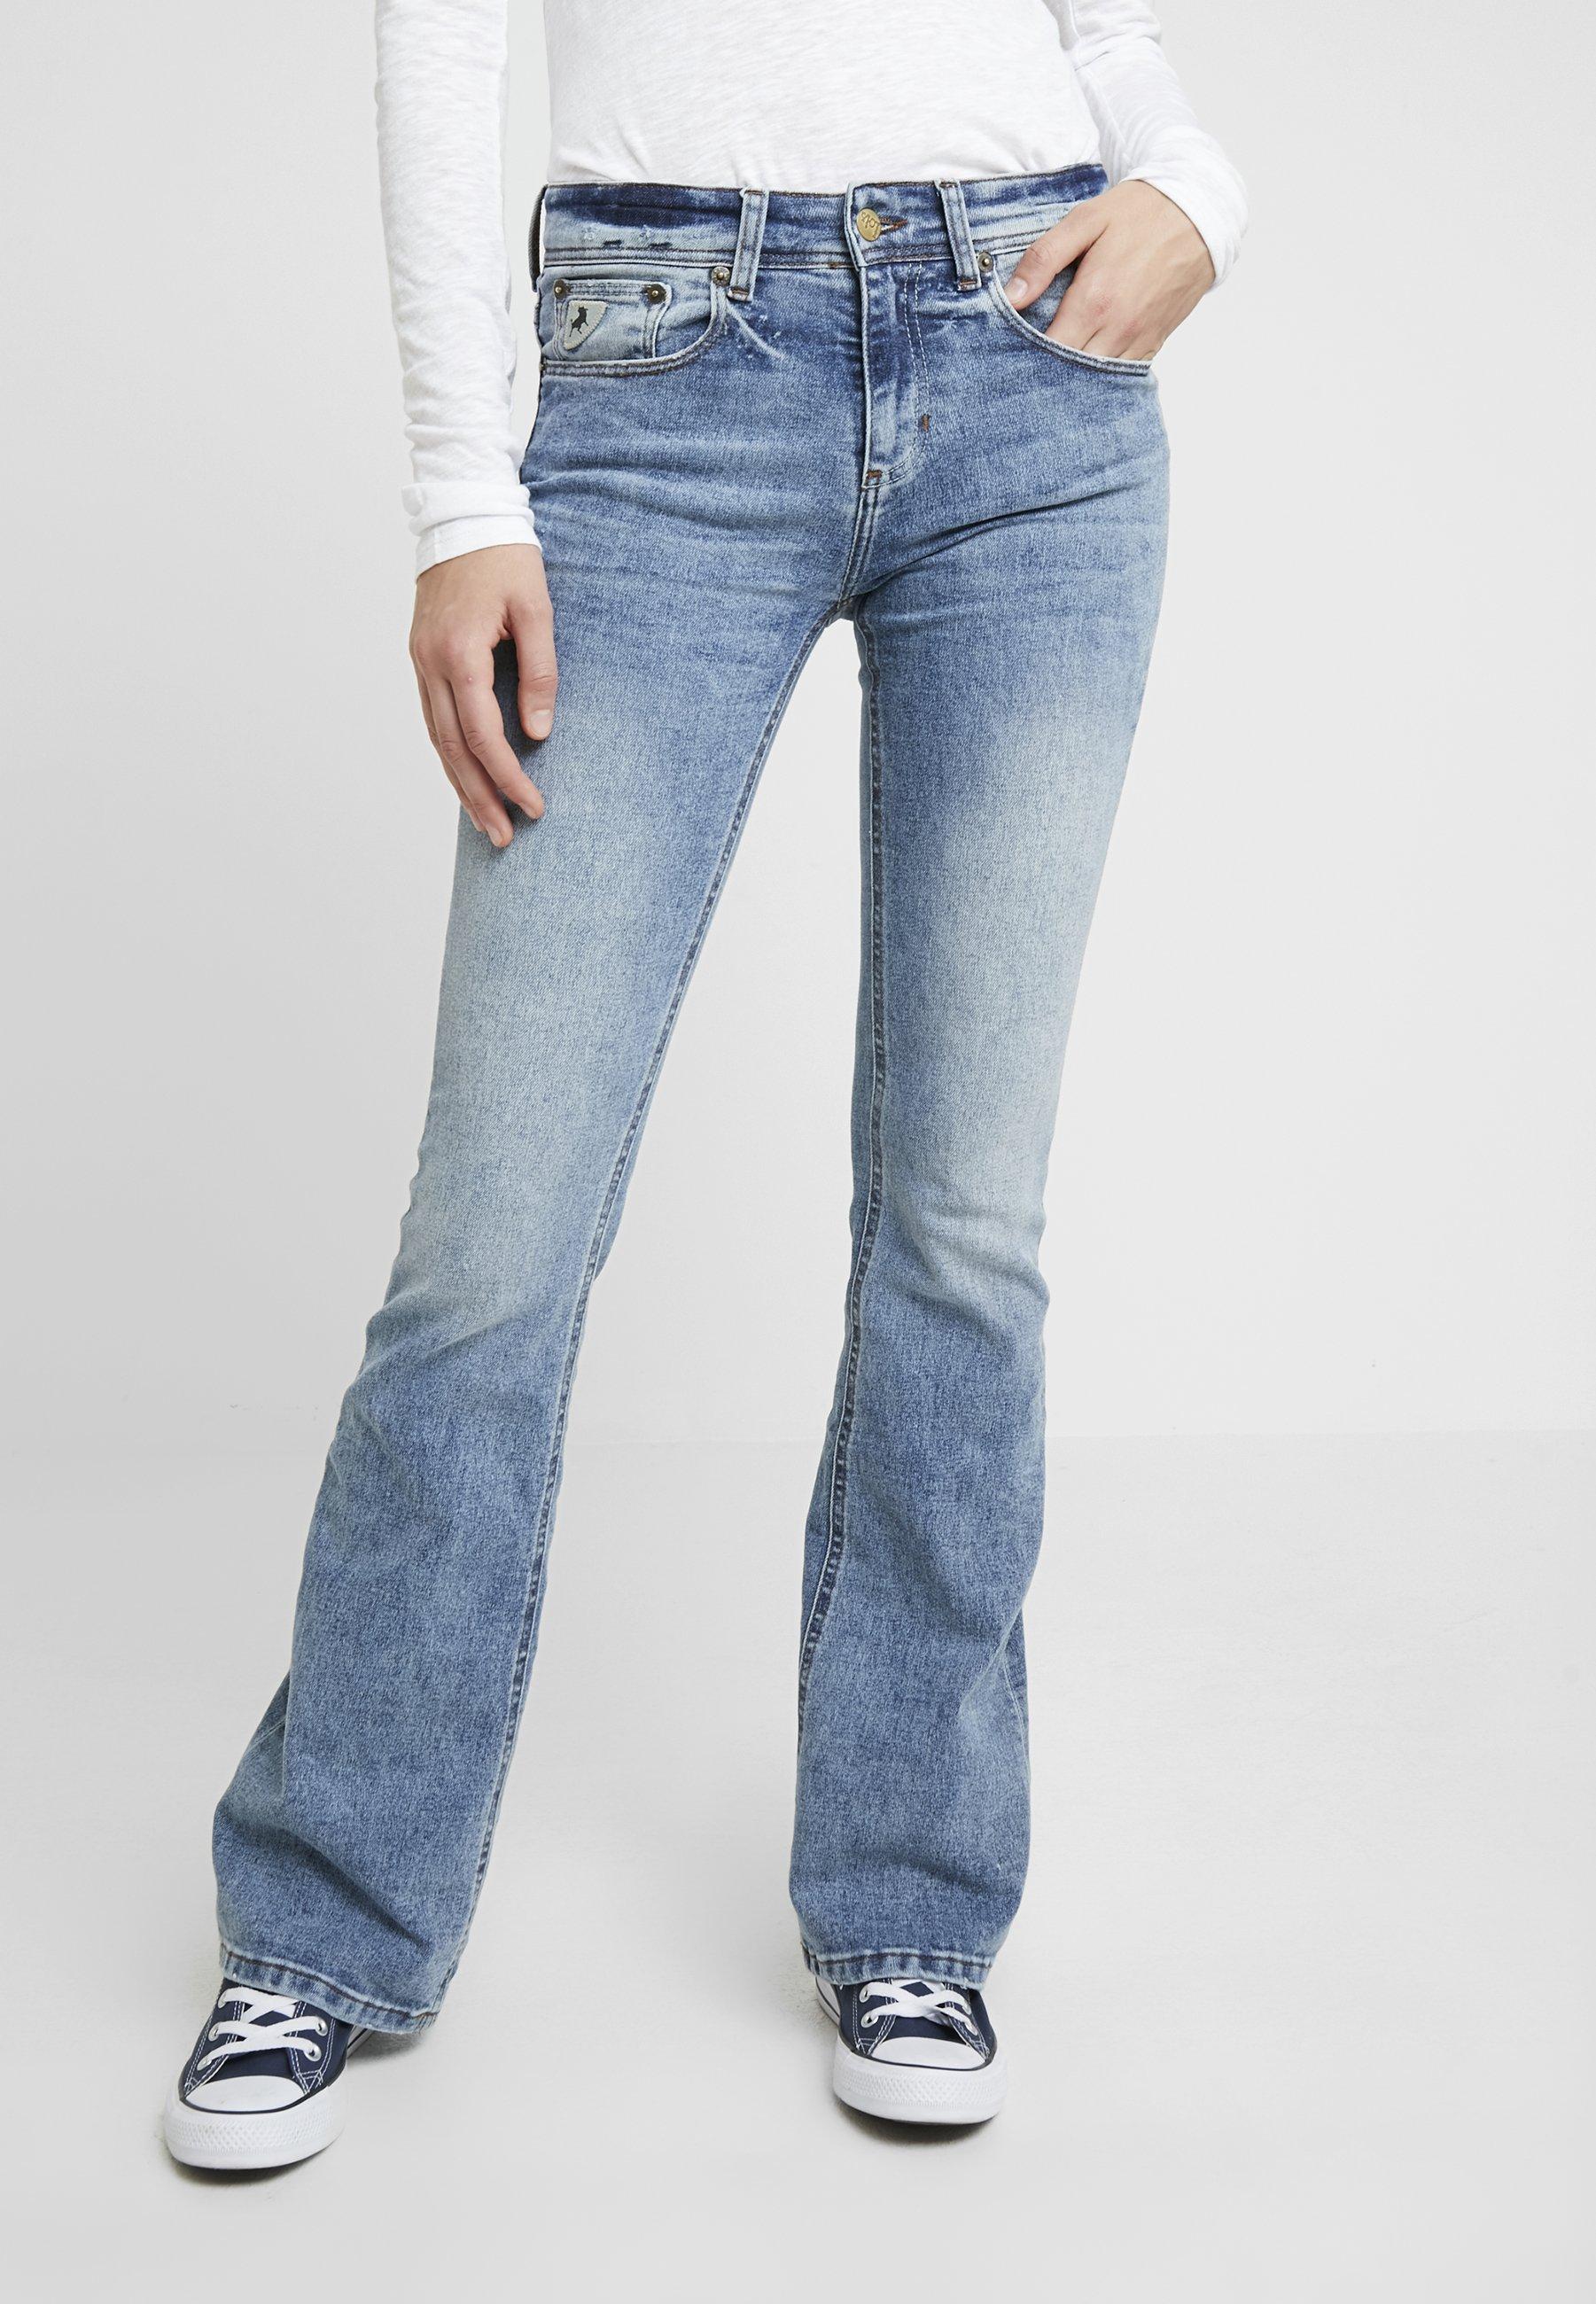 Jeans Lois Flare MelroseJean Wash Stone IbW29YeEDH